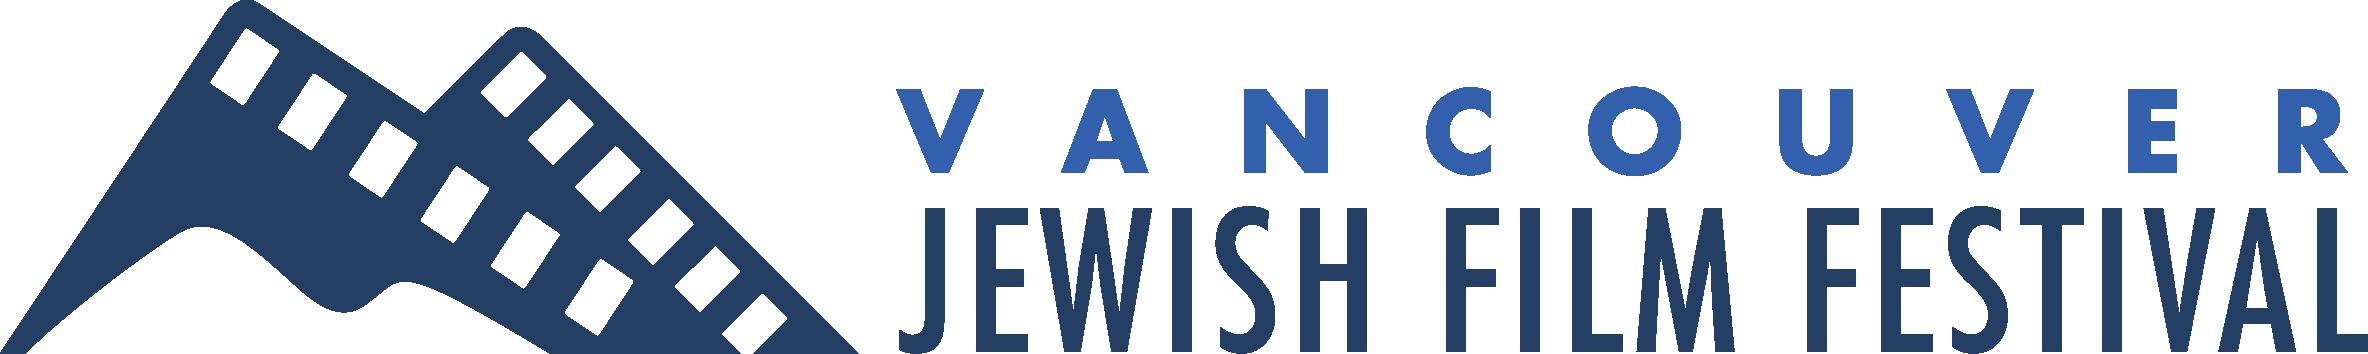 Vancouver Jewish Film Festival – Inspire • Connect • Educate